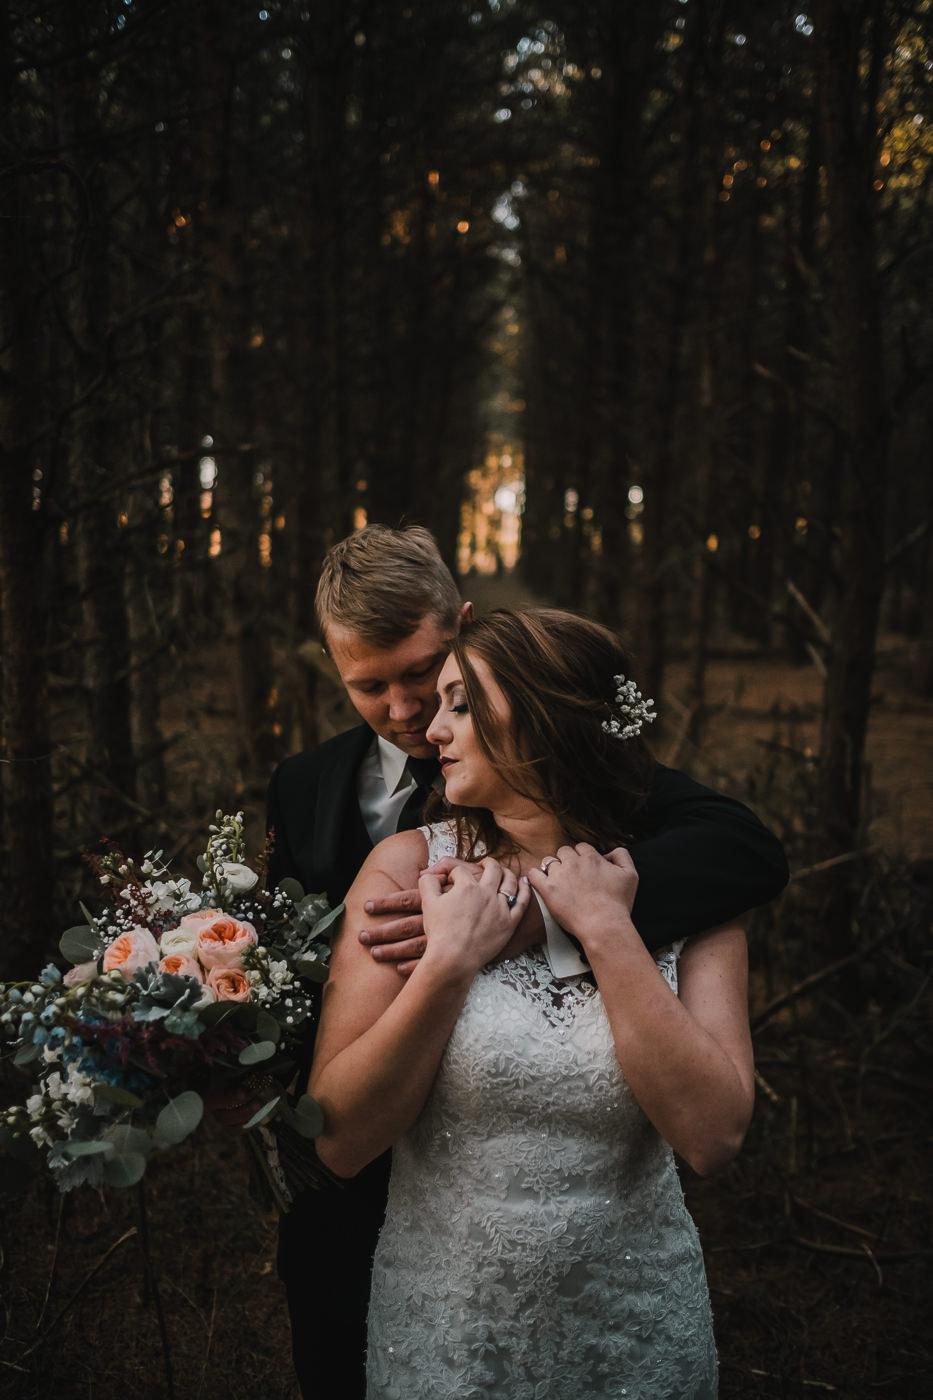 rogers.arkansas.weddingphotos.©2018mileswittboyer-27.jpg